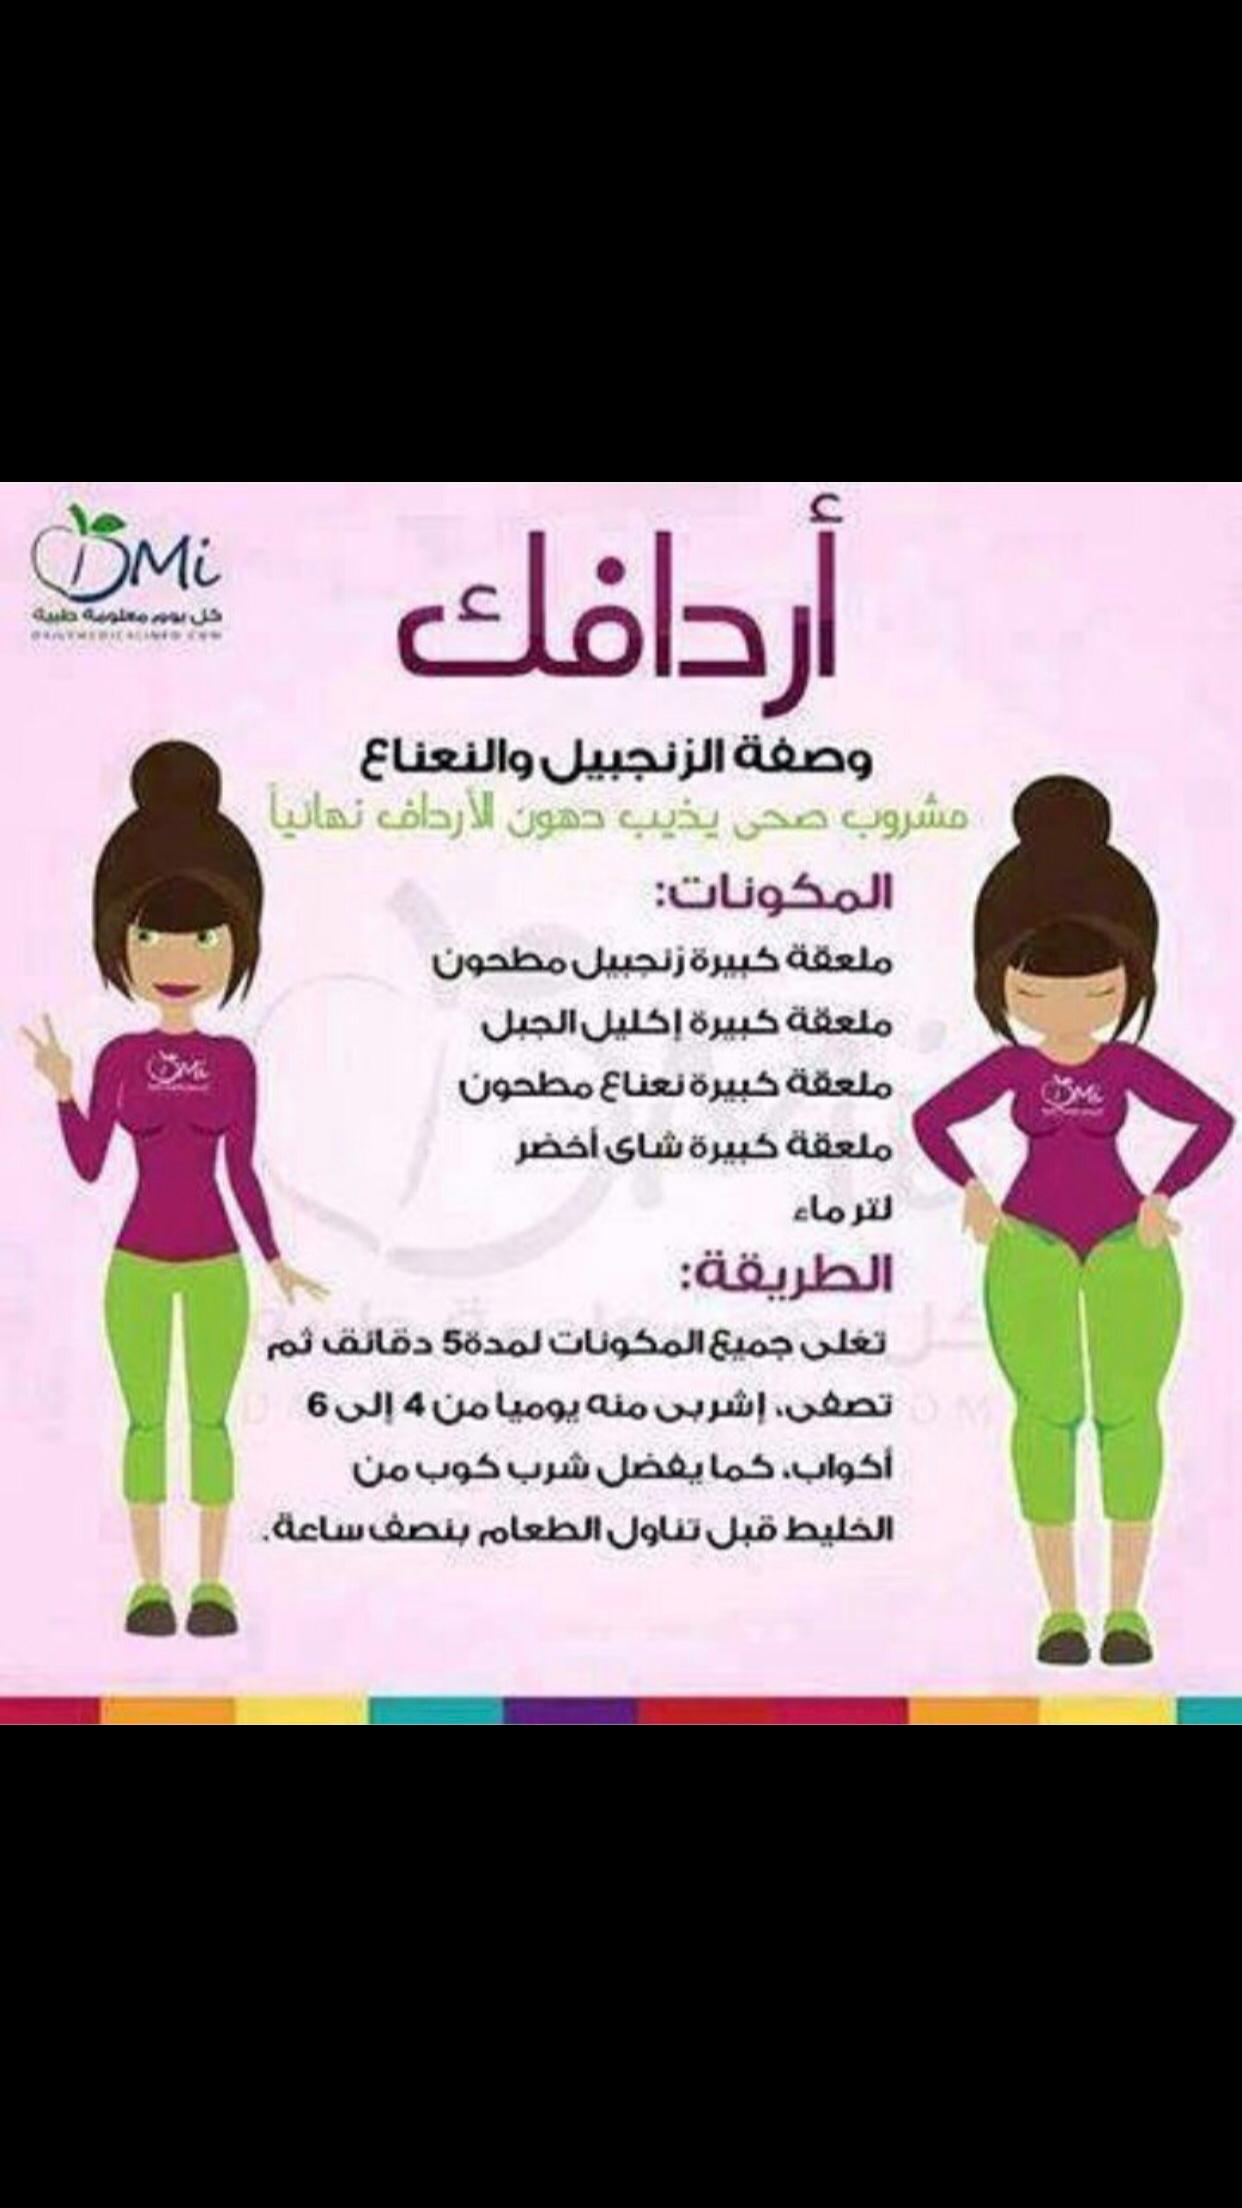 زنجبيل ونعناع للارداف Health Fitness Nutrition Health And Fitness Expo Body Health